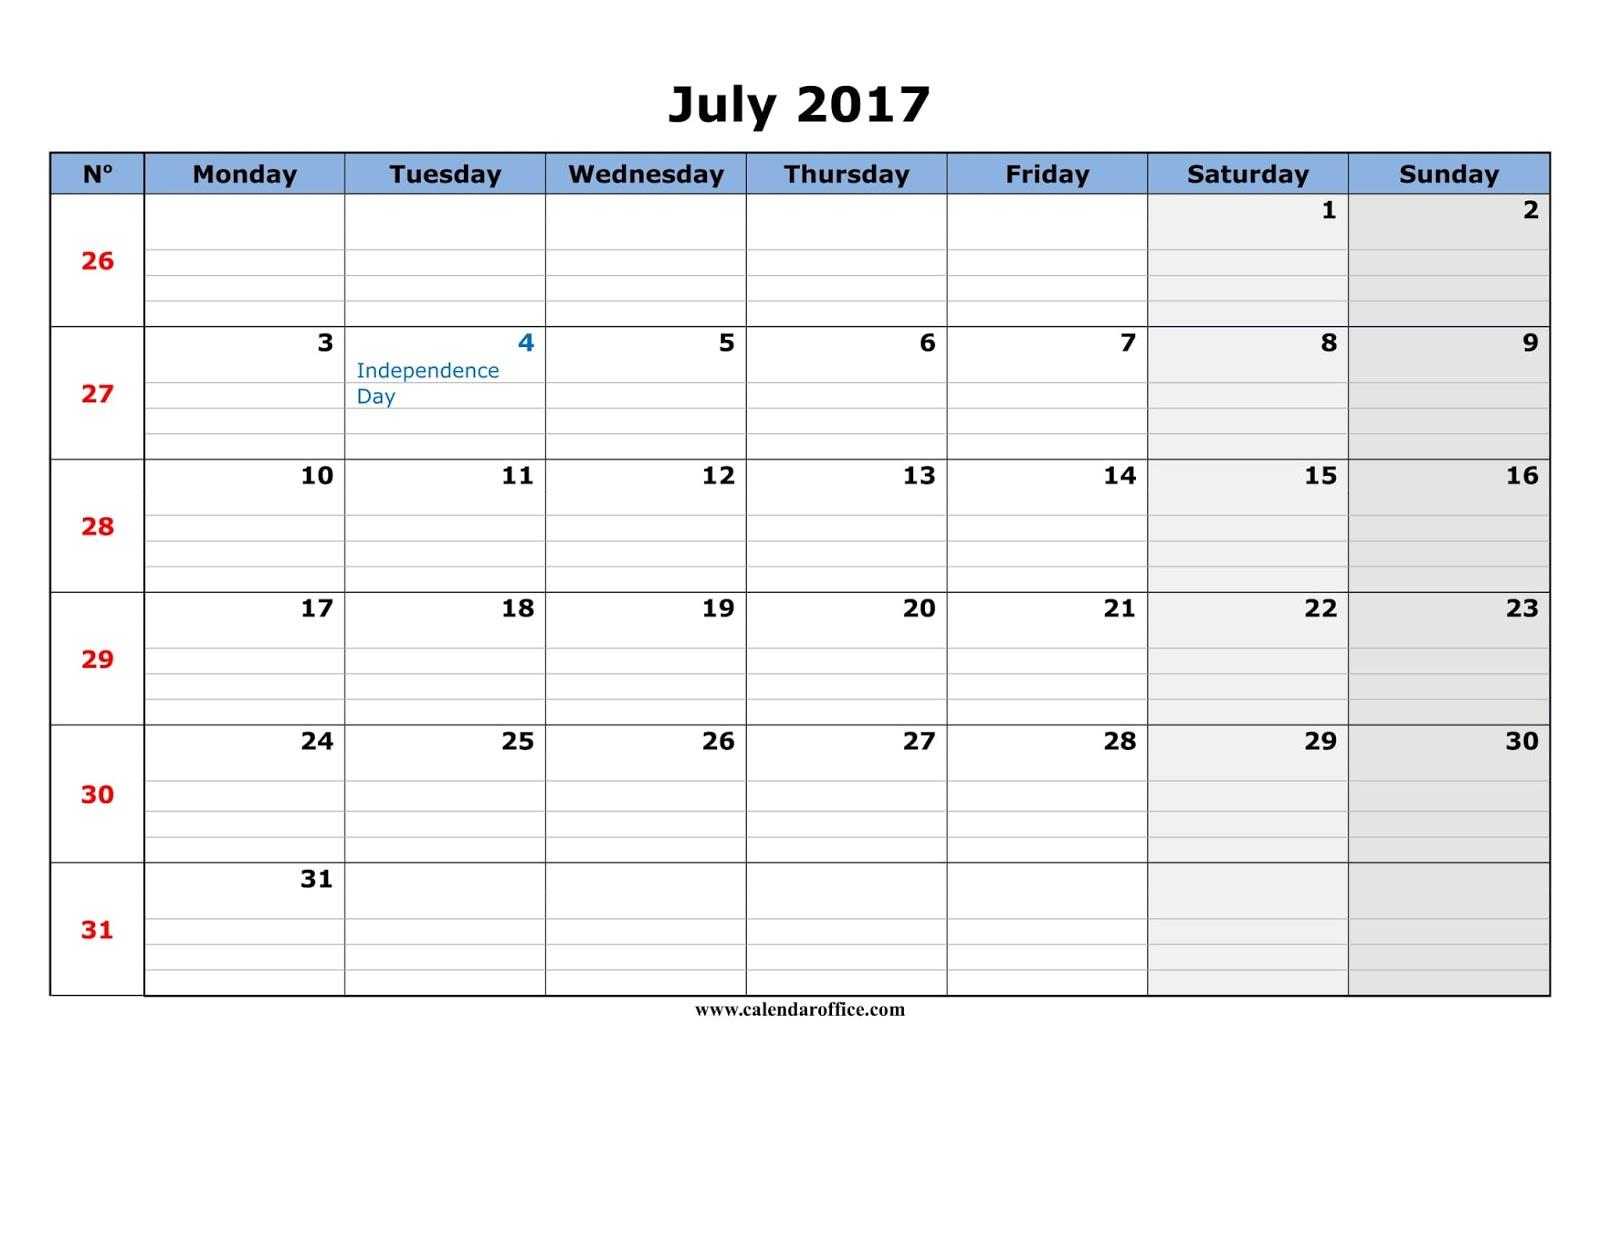 July 2017 Calendar Printable   July 2017 Calendar Template - Blank ...